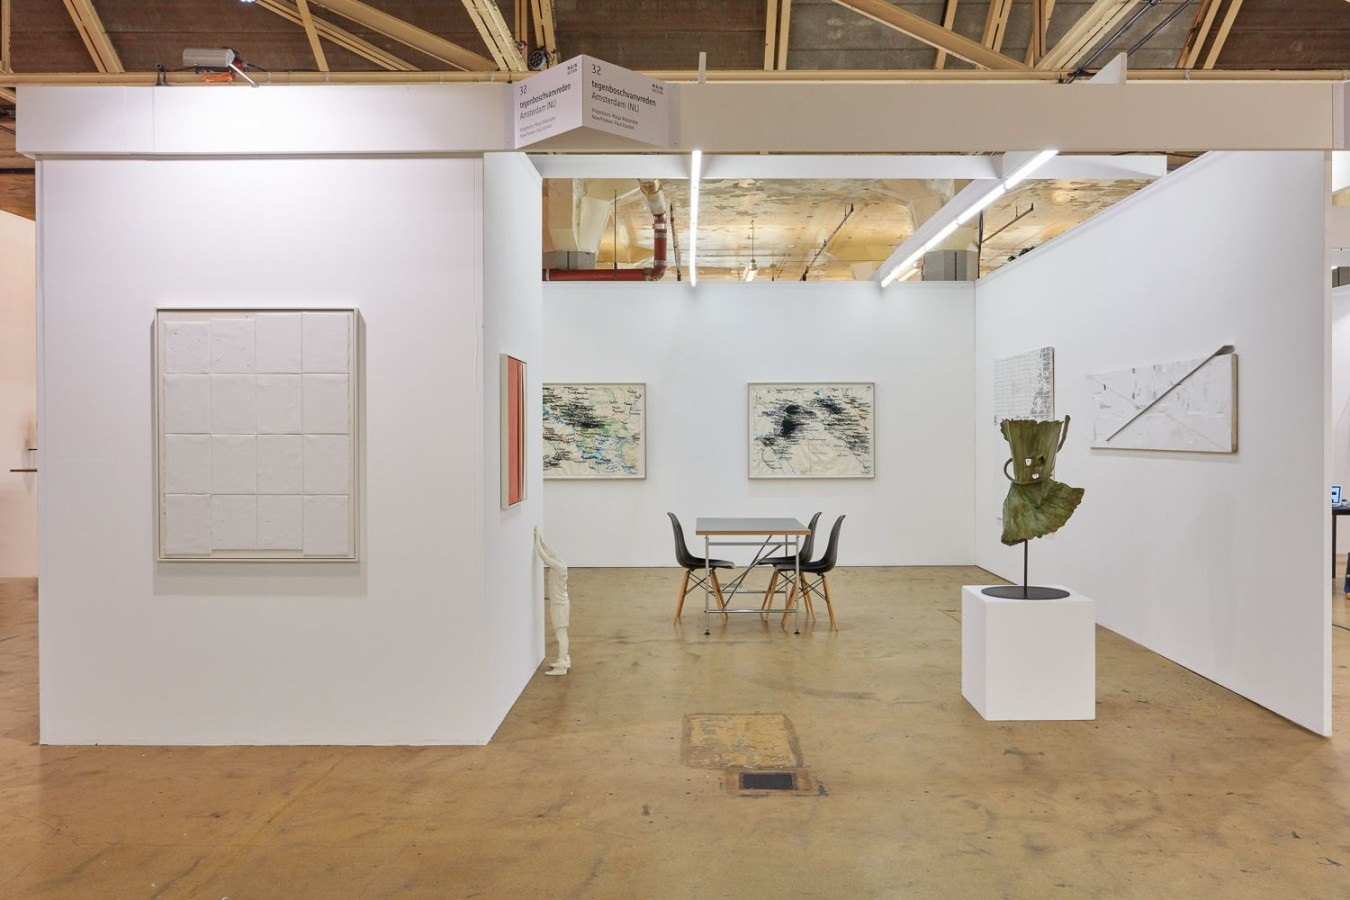 Art Rotterdam 2019, Daniëlle van Ark, Fernando Sánchez Castillo, Ricardo van Eyk, Paul Kooiker, Cristina Lucas, Chaim van Luit, Dieuwke Spaans, Maya Watanabe,